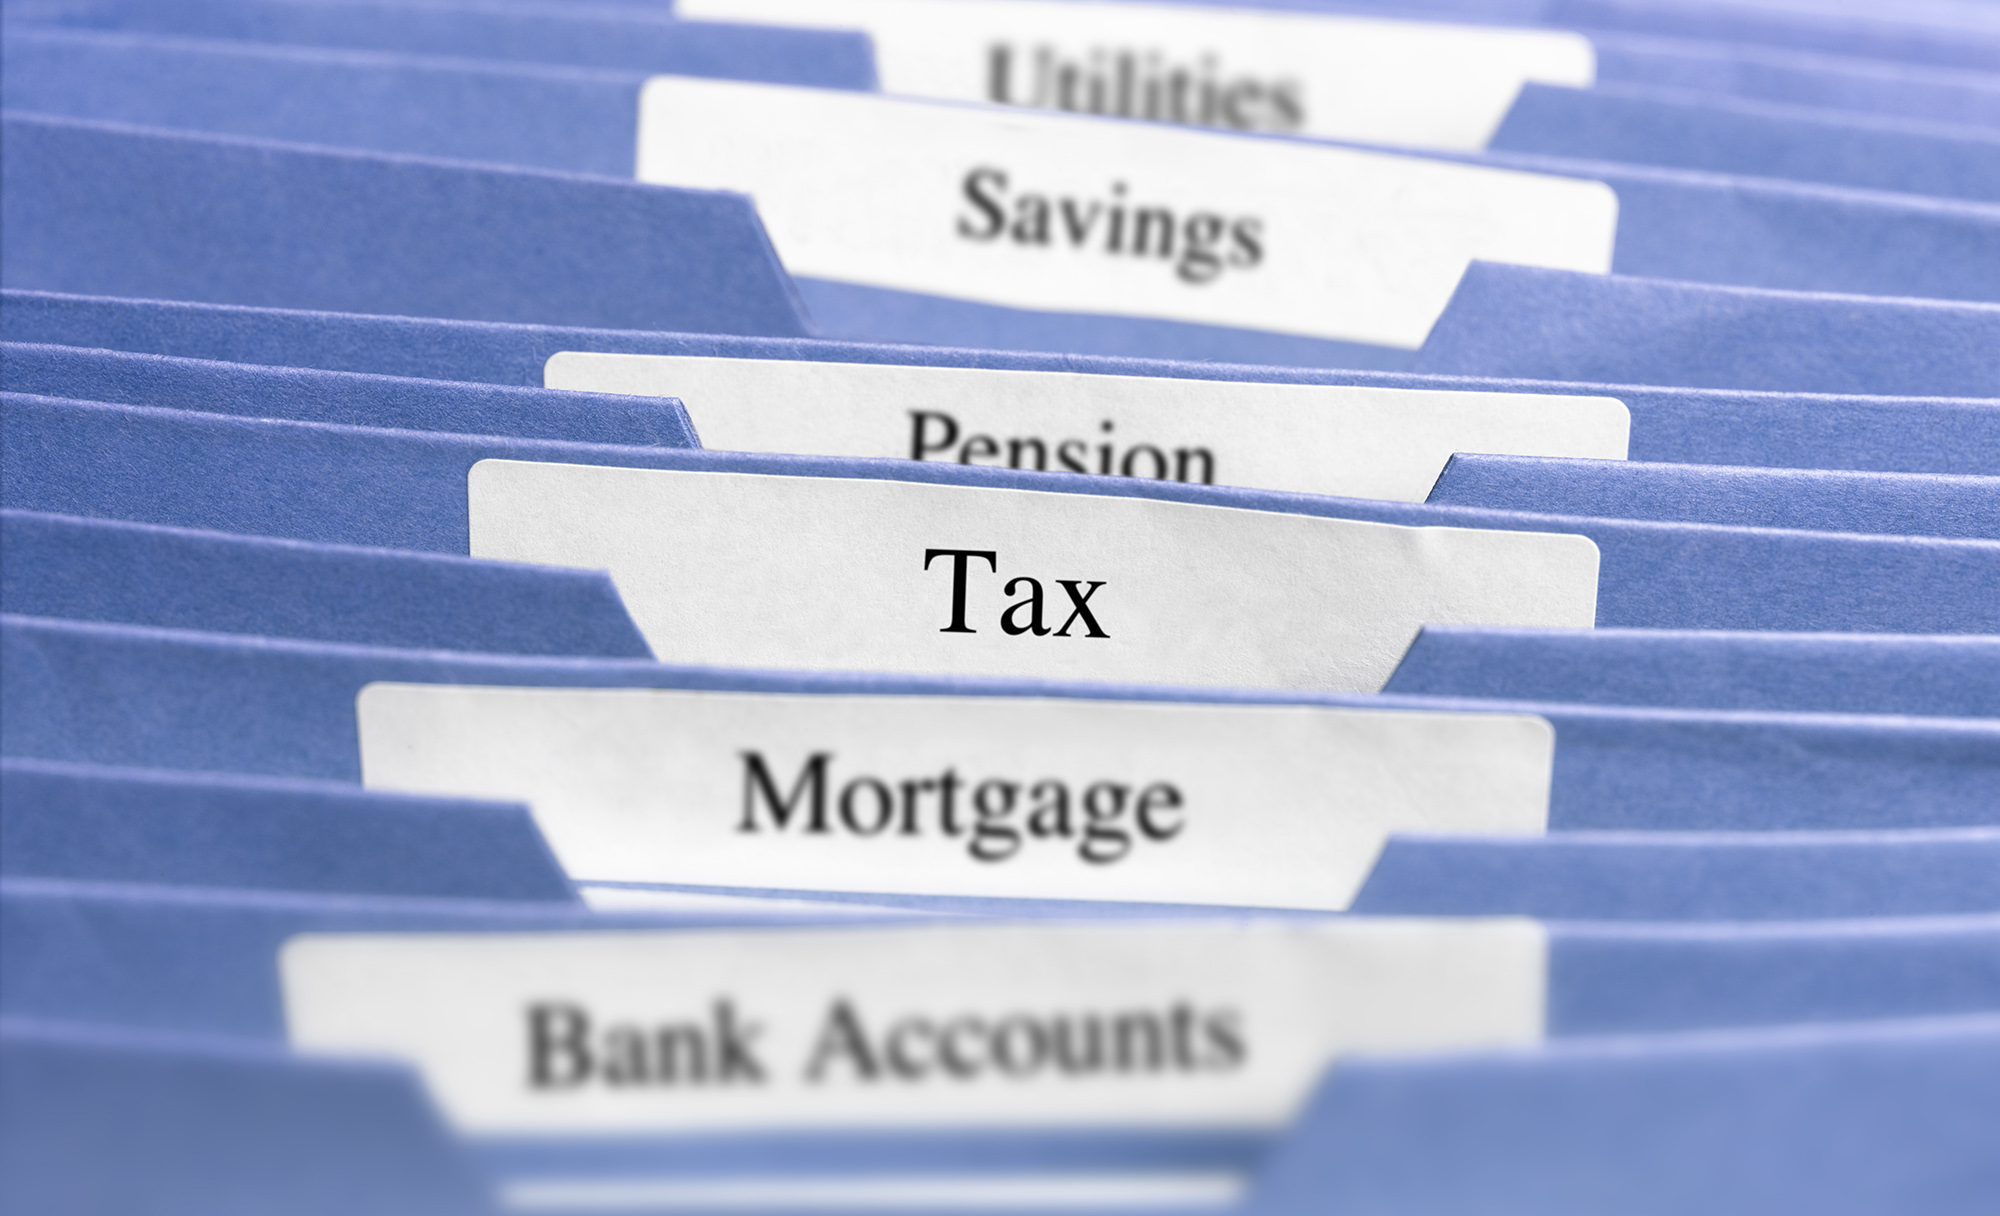 Tax file folders